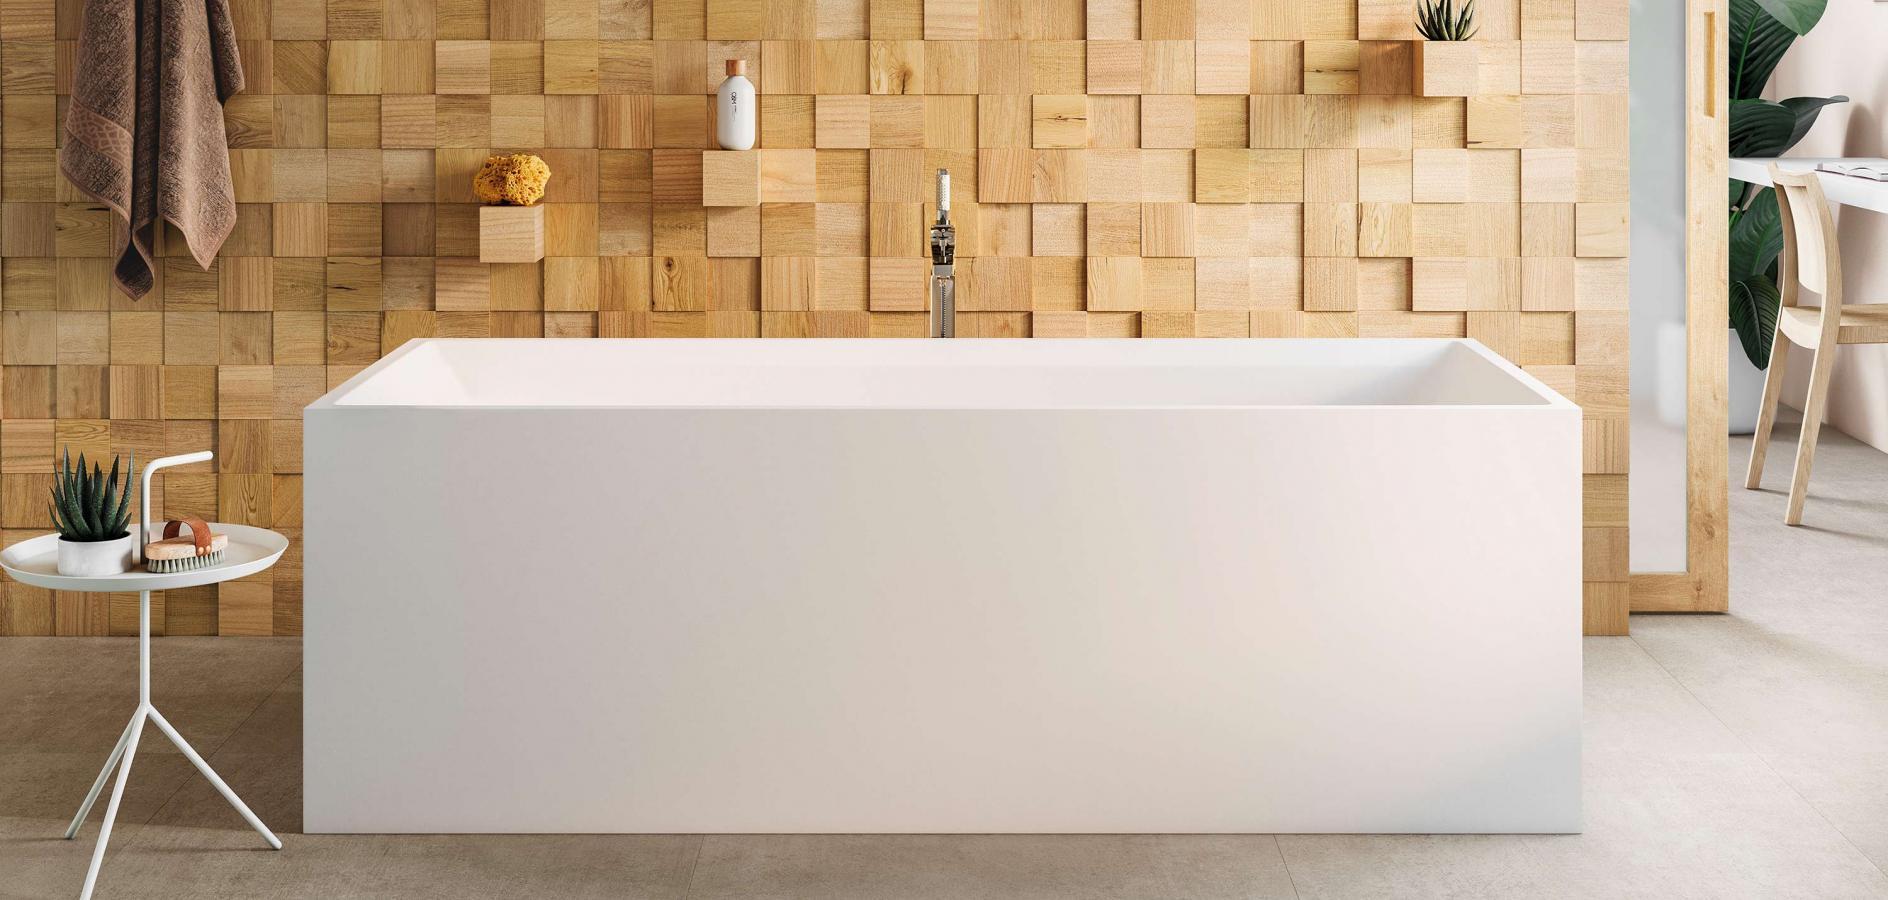 Discover Freestanding Bathtubs With Roca Roca Life